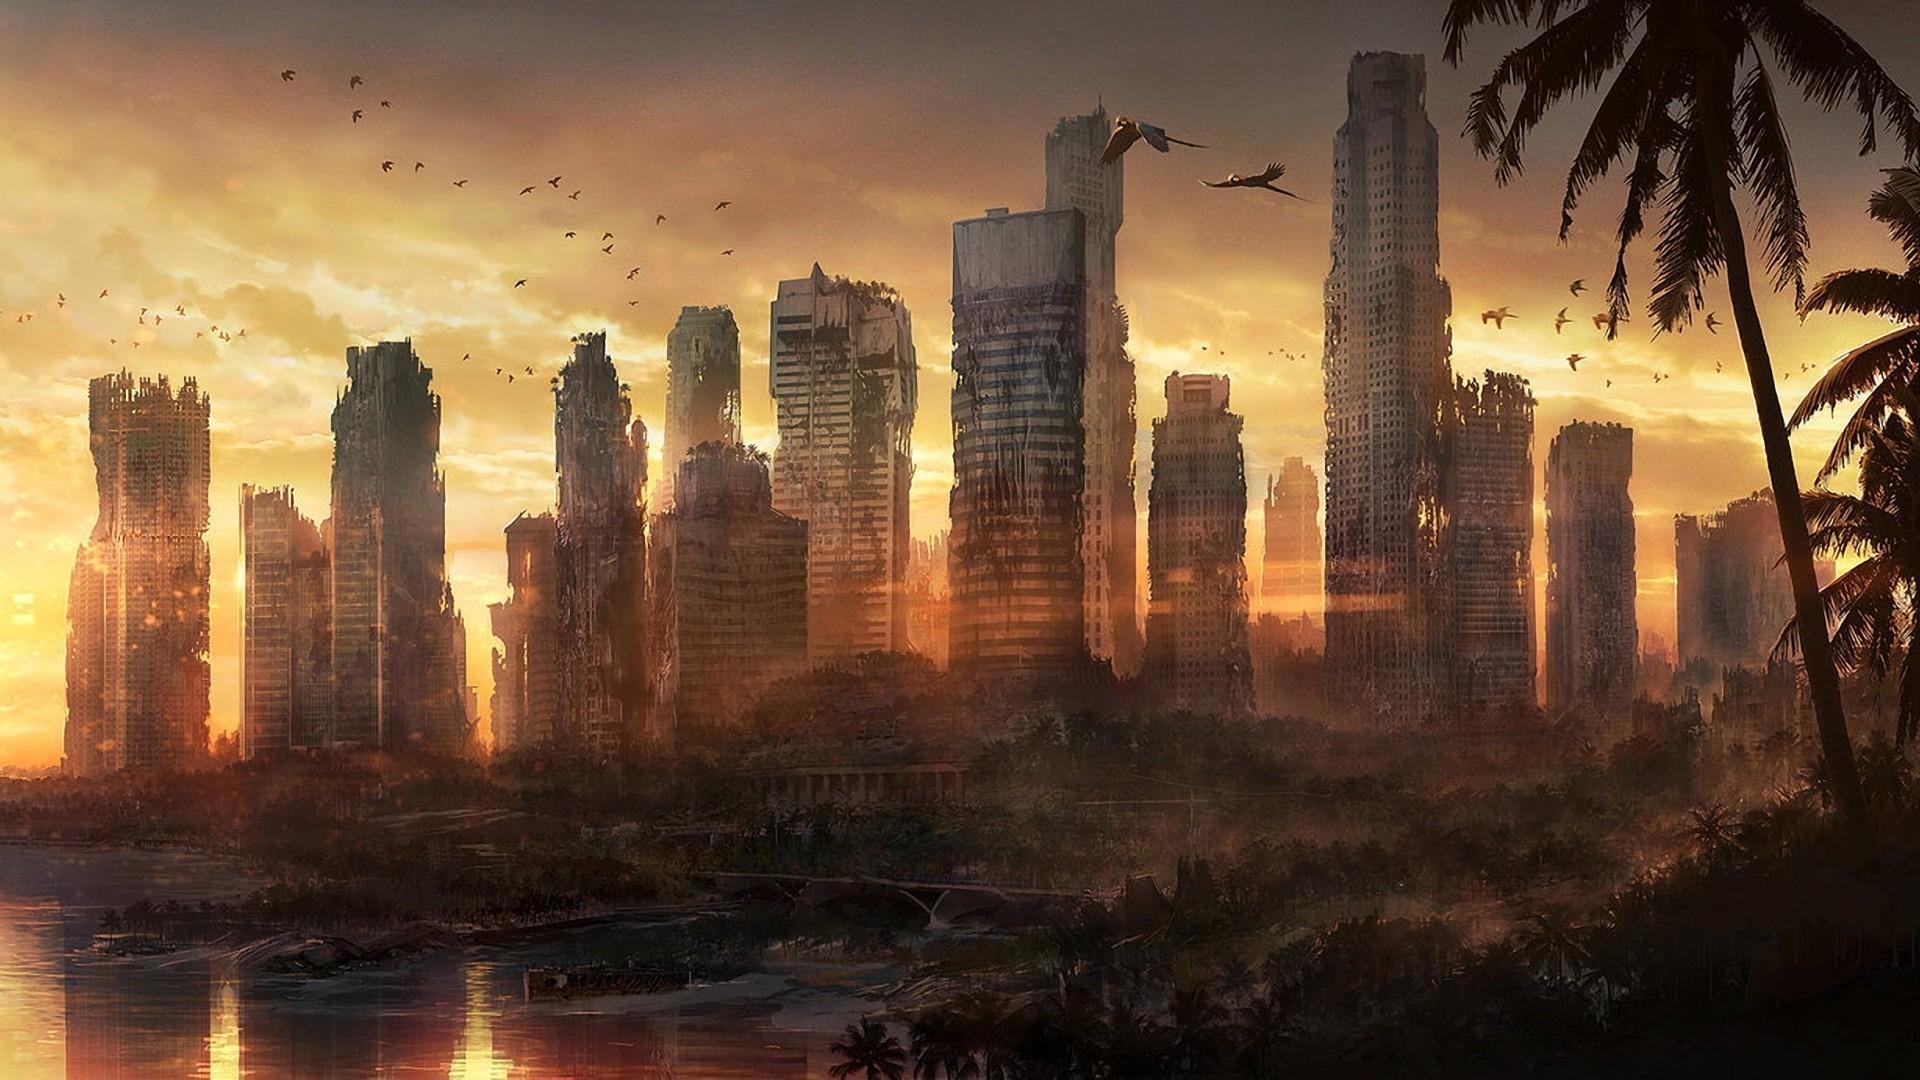 Apocalypse City Fire Apocalyptic Wallpaper ...